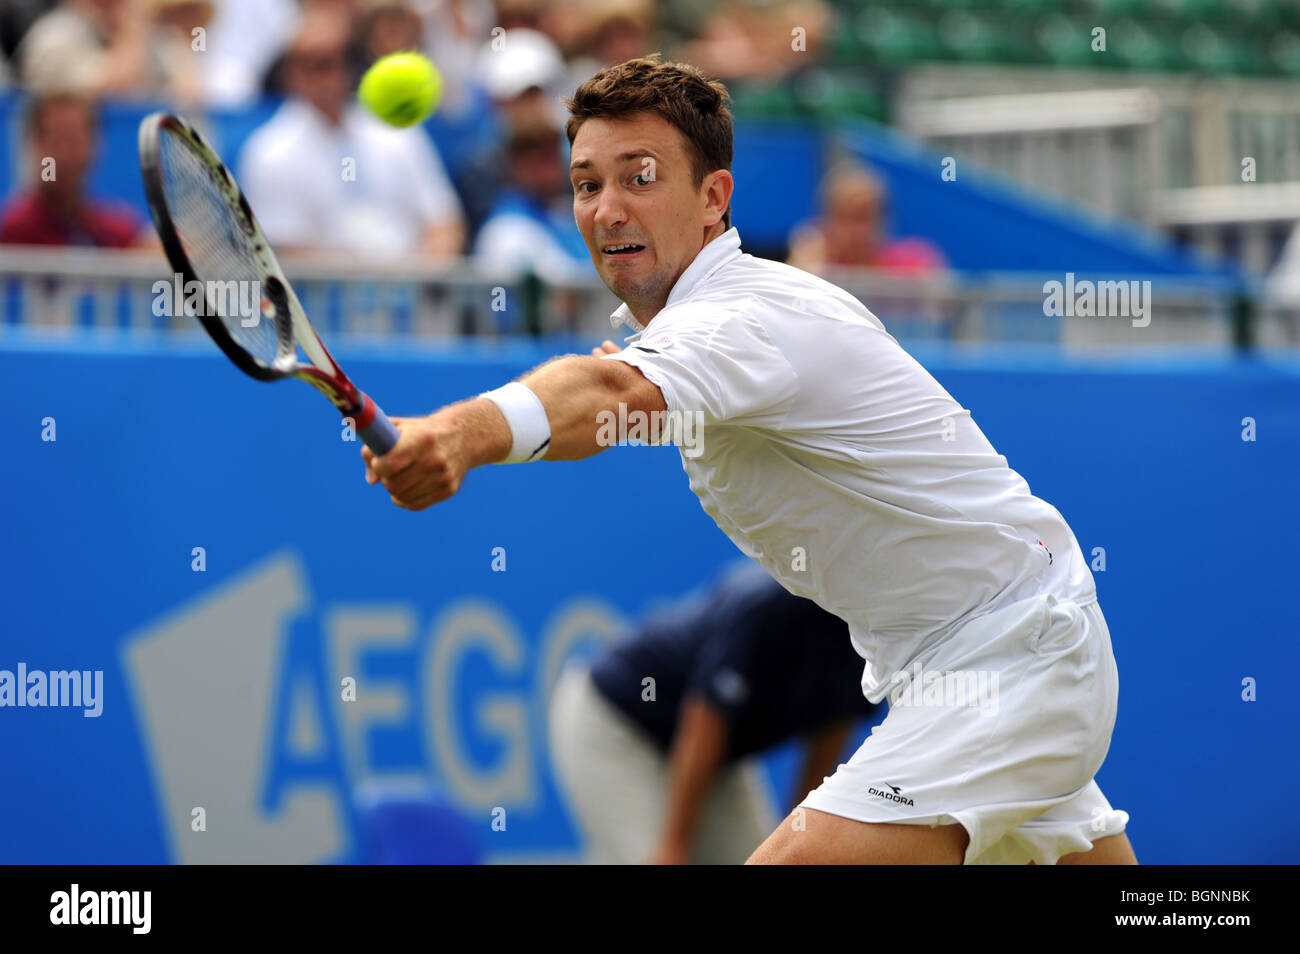 Alex Bogdanovic in action during the Aegon International 2009 Tennis Championships at Devonshire Park Eastbourne - Stock Image